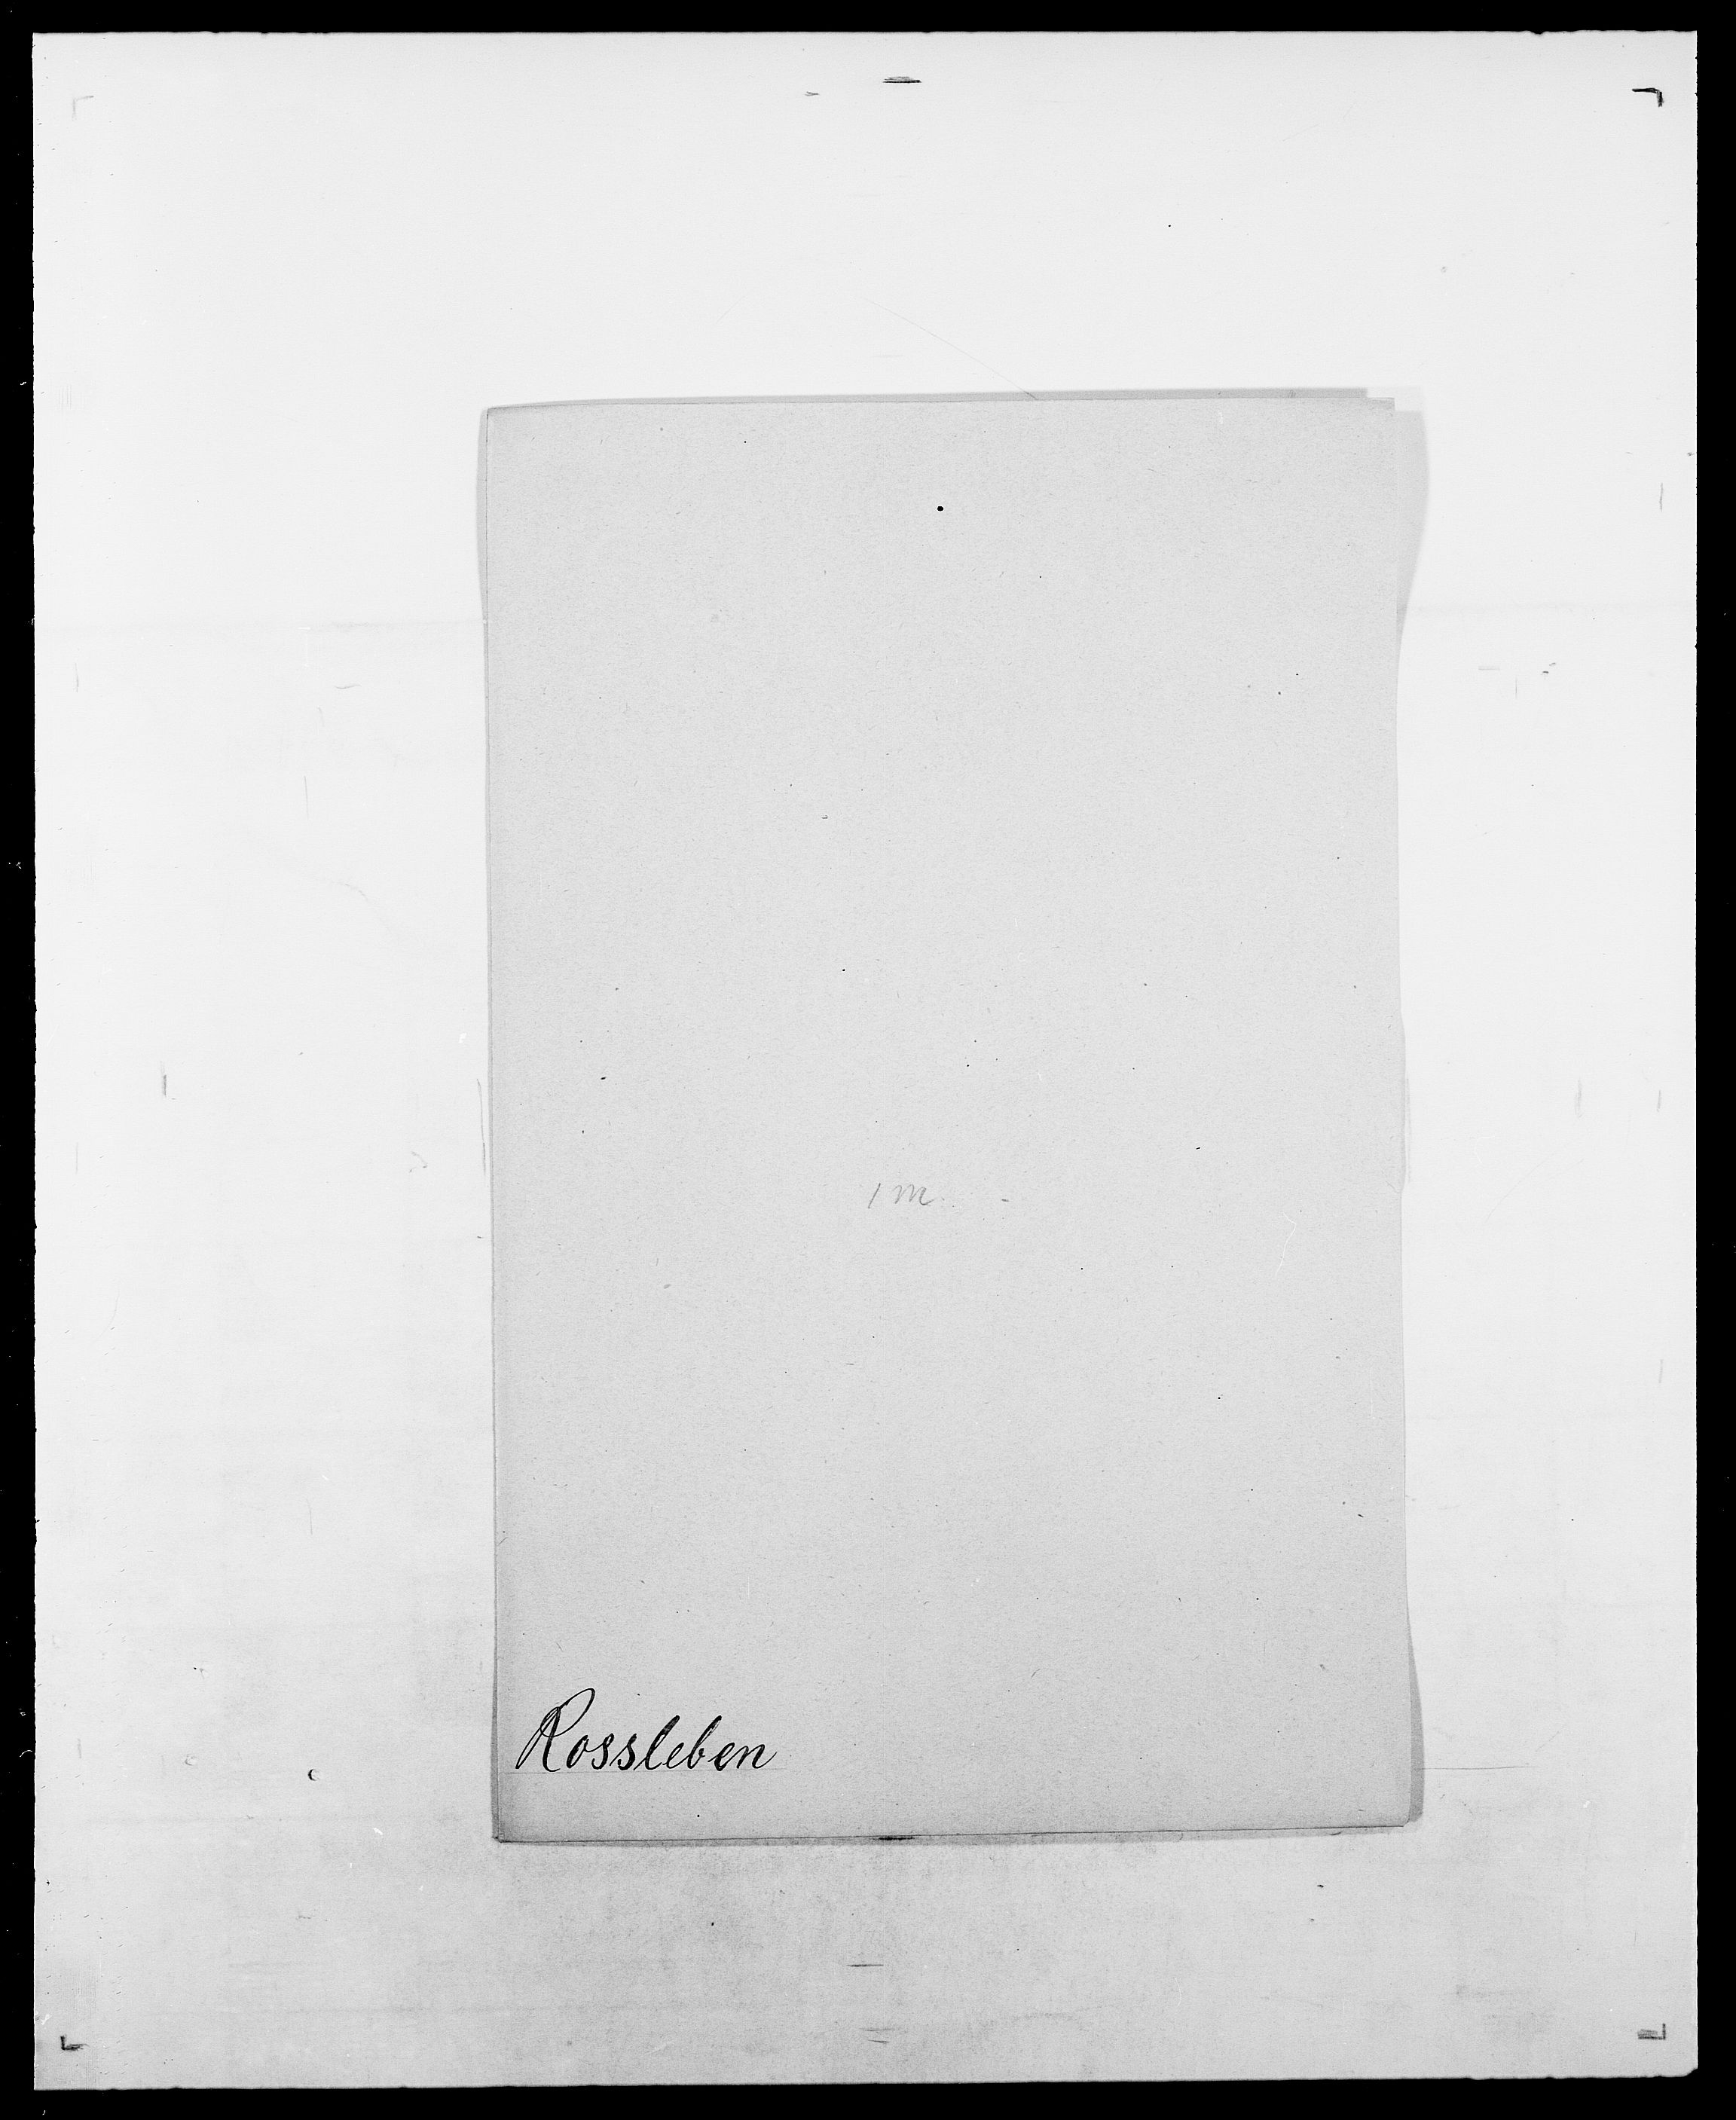 SAO, Delgobe, Charles Antoine - samling, D/Da/L0033: Roald - Røyem, s. 351